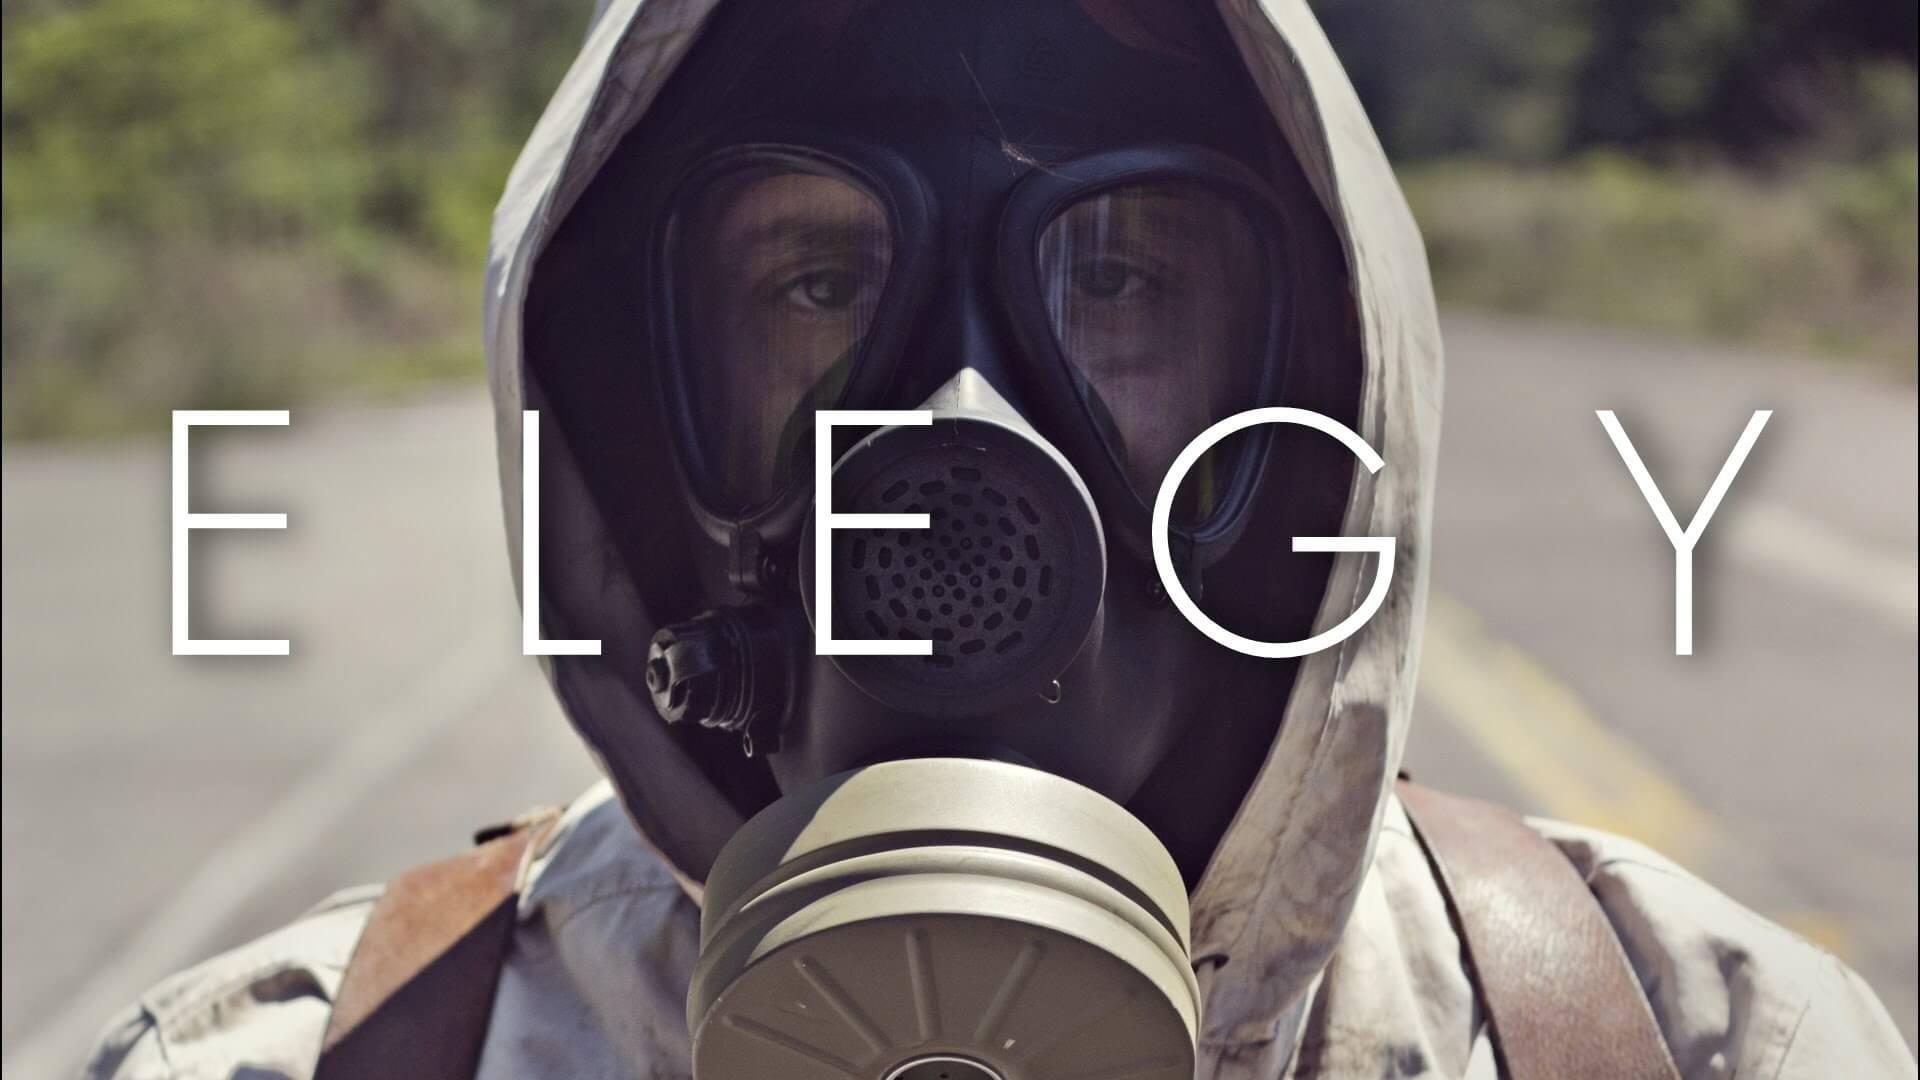 Elegy Short Film Log